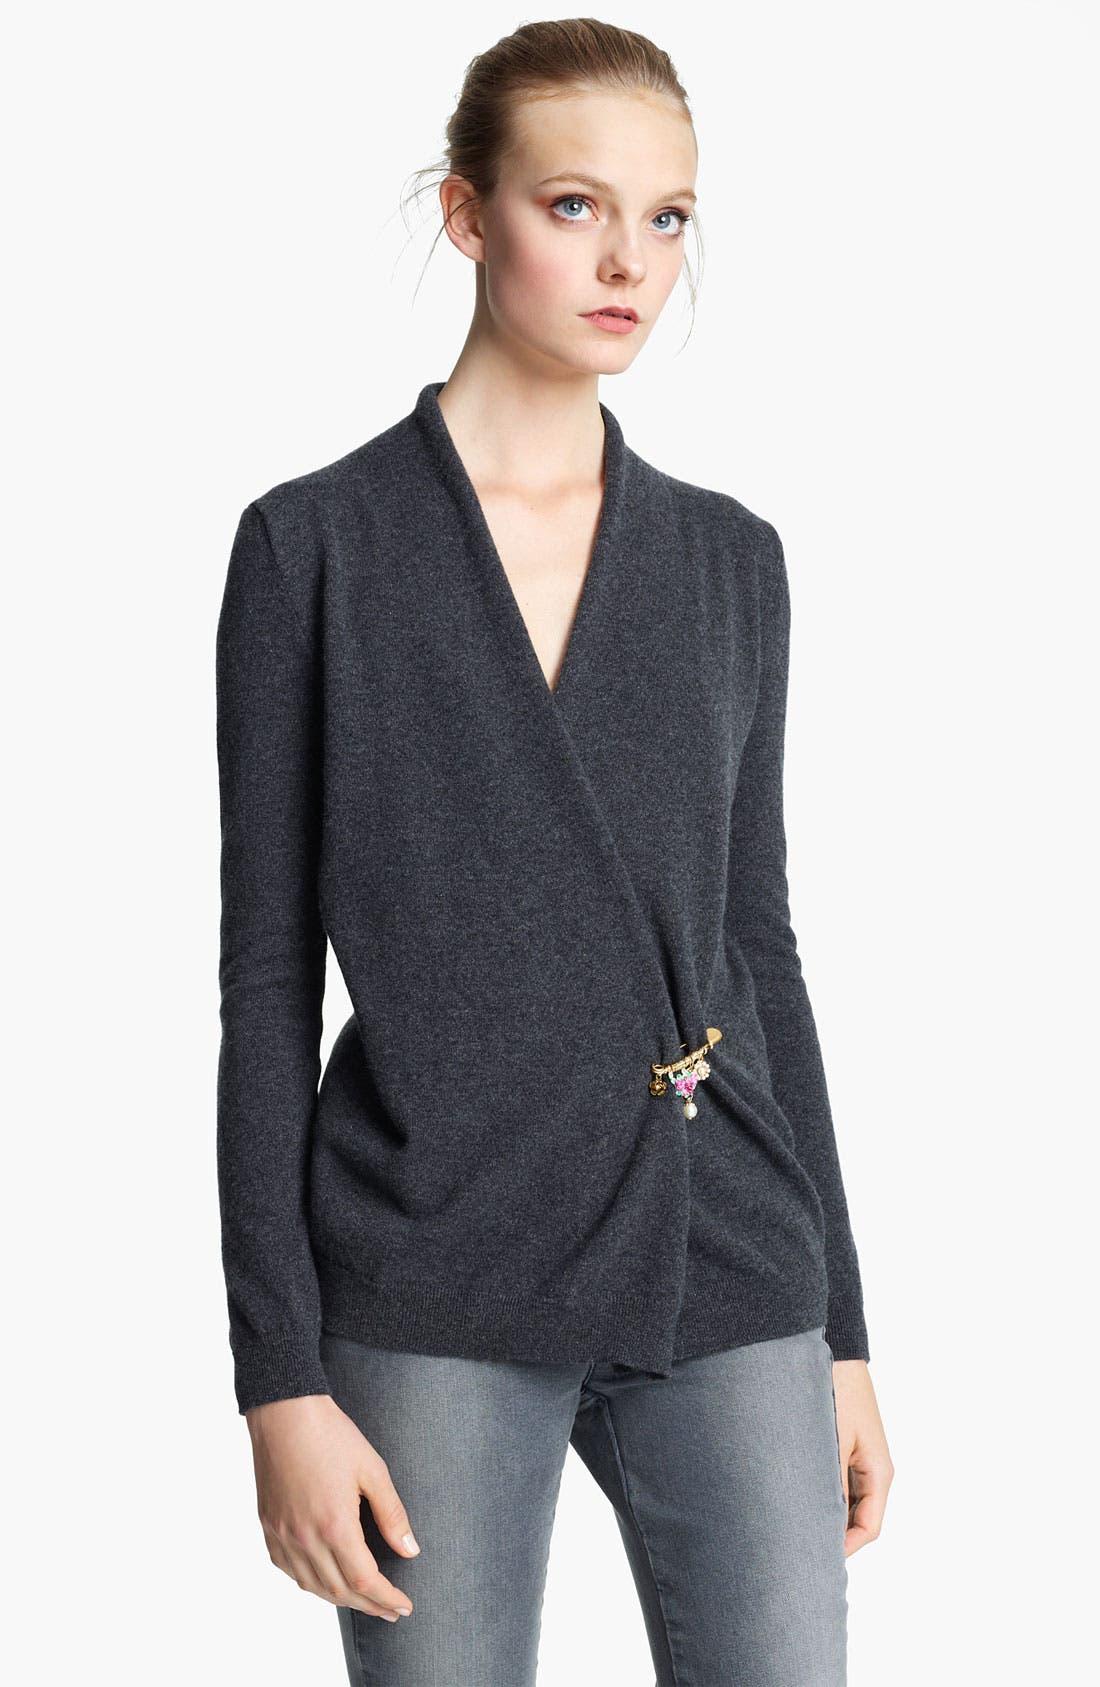 Main Image - Dolce&Gabbana Cashmere Cardigan with Embellished Pin